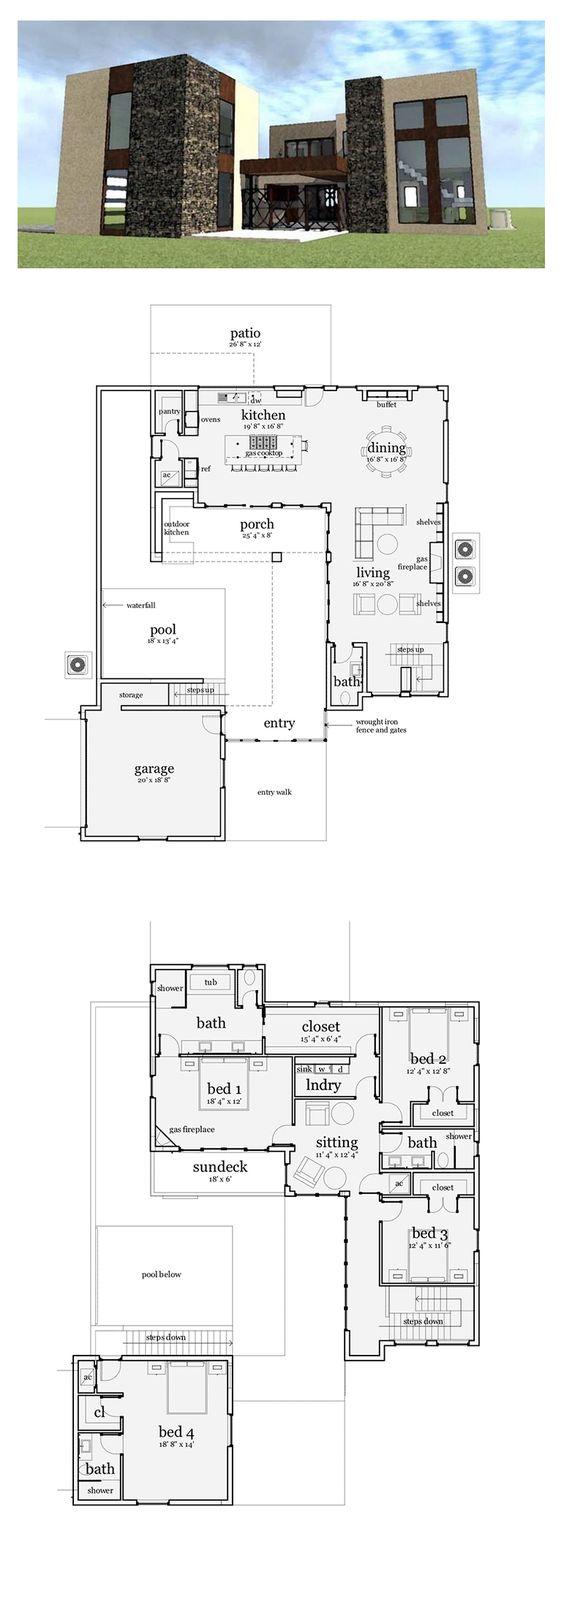 House, Modern houses and Modern house plans on Pinterest - ^